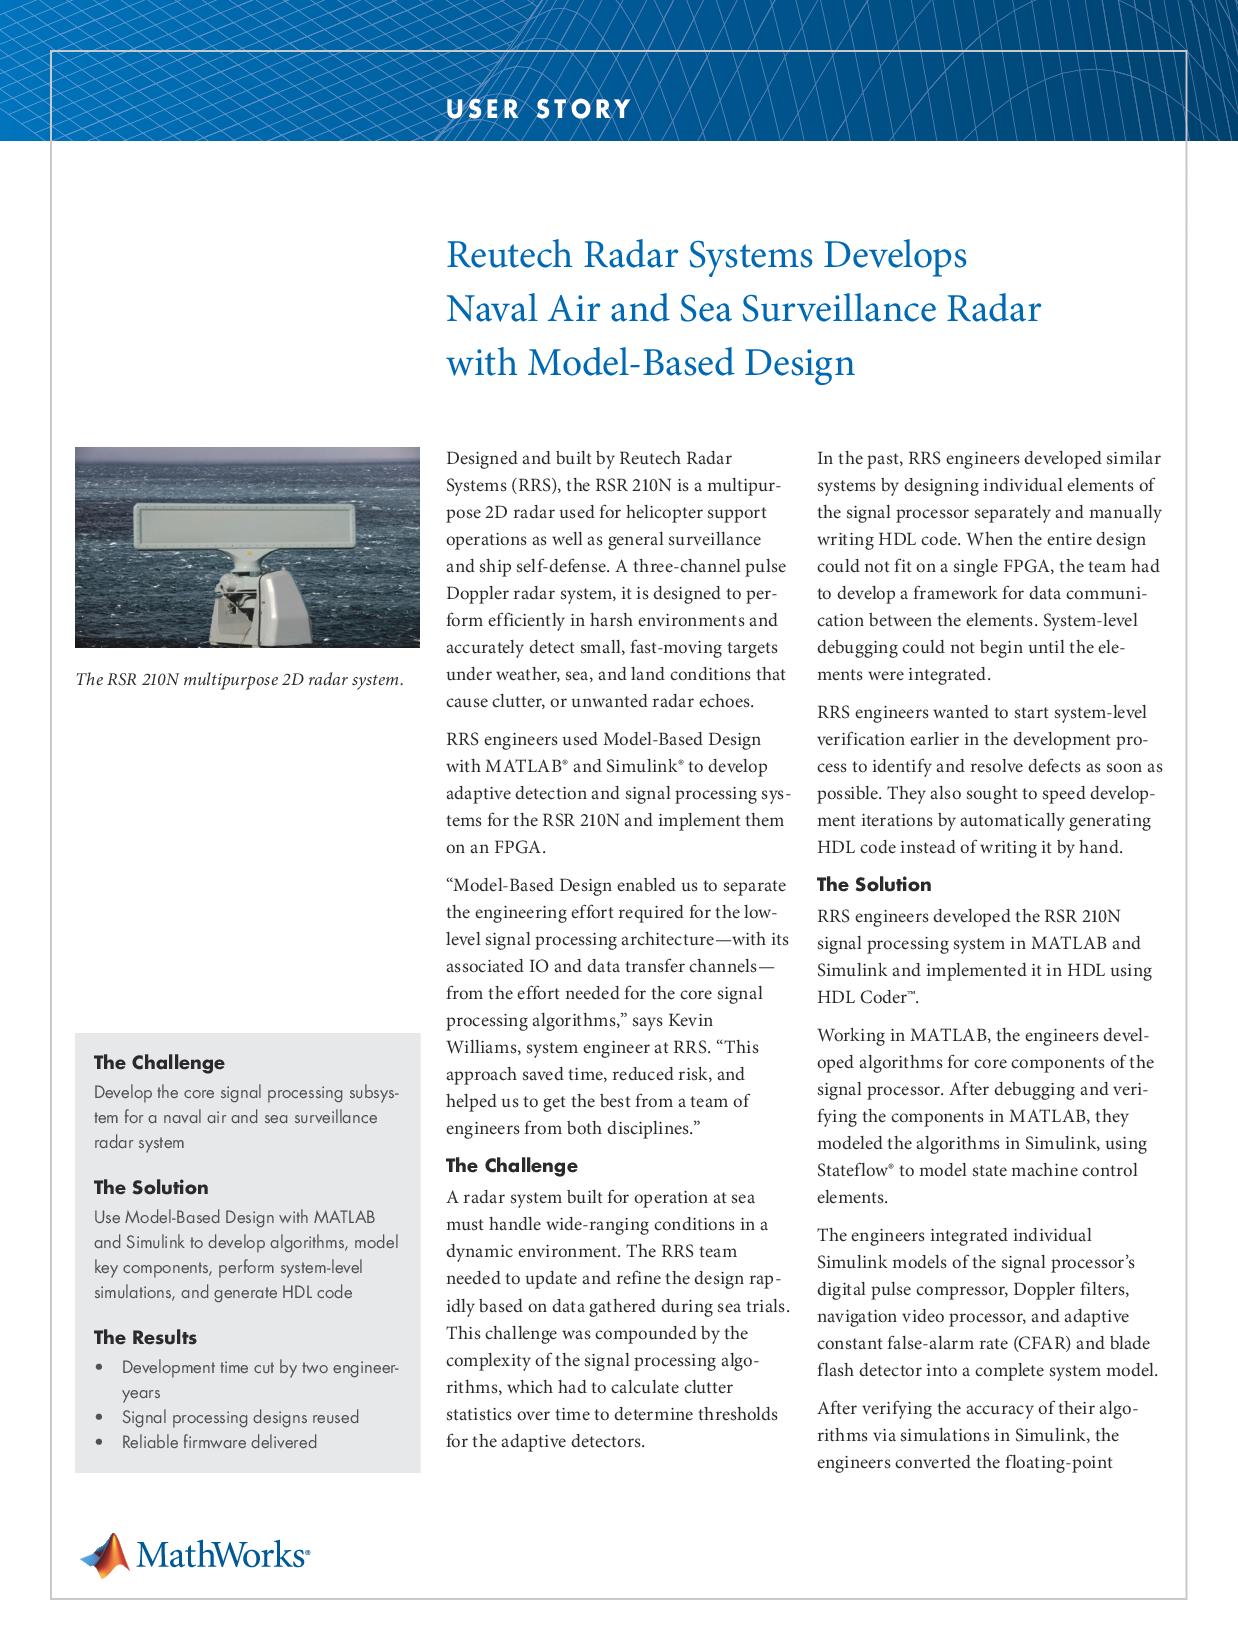 Reutech Radar Systems Develops Naval Air and Sea Surveillanc